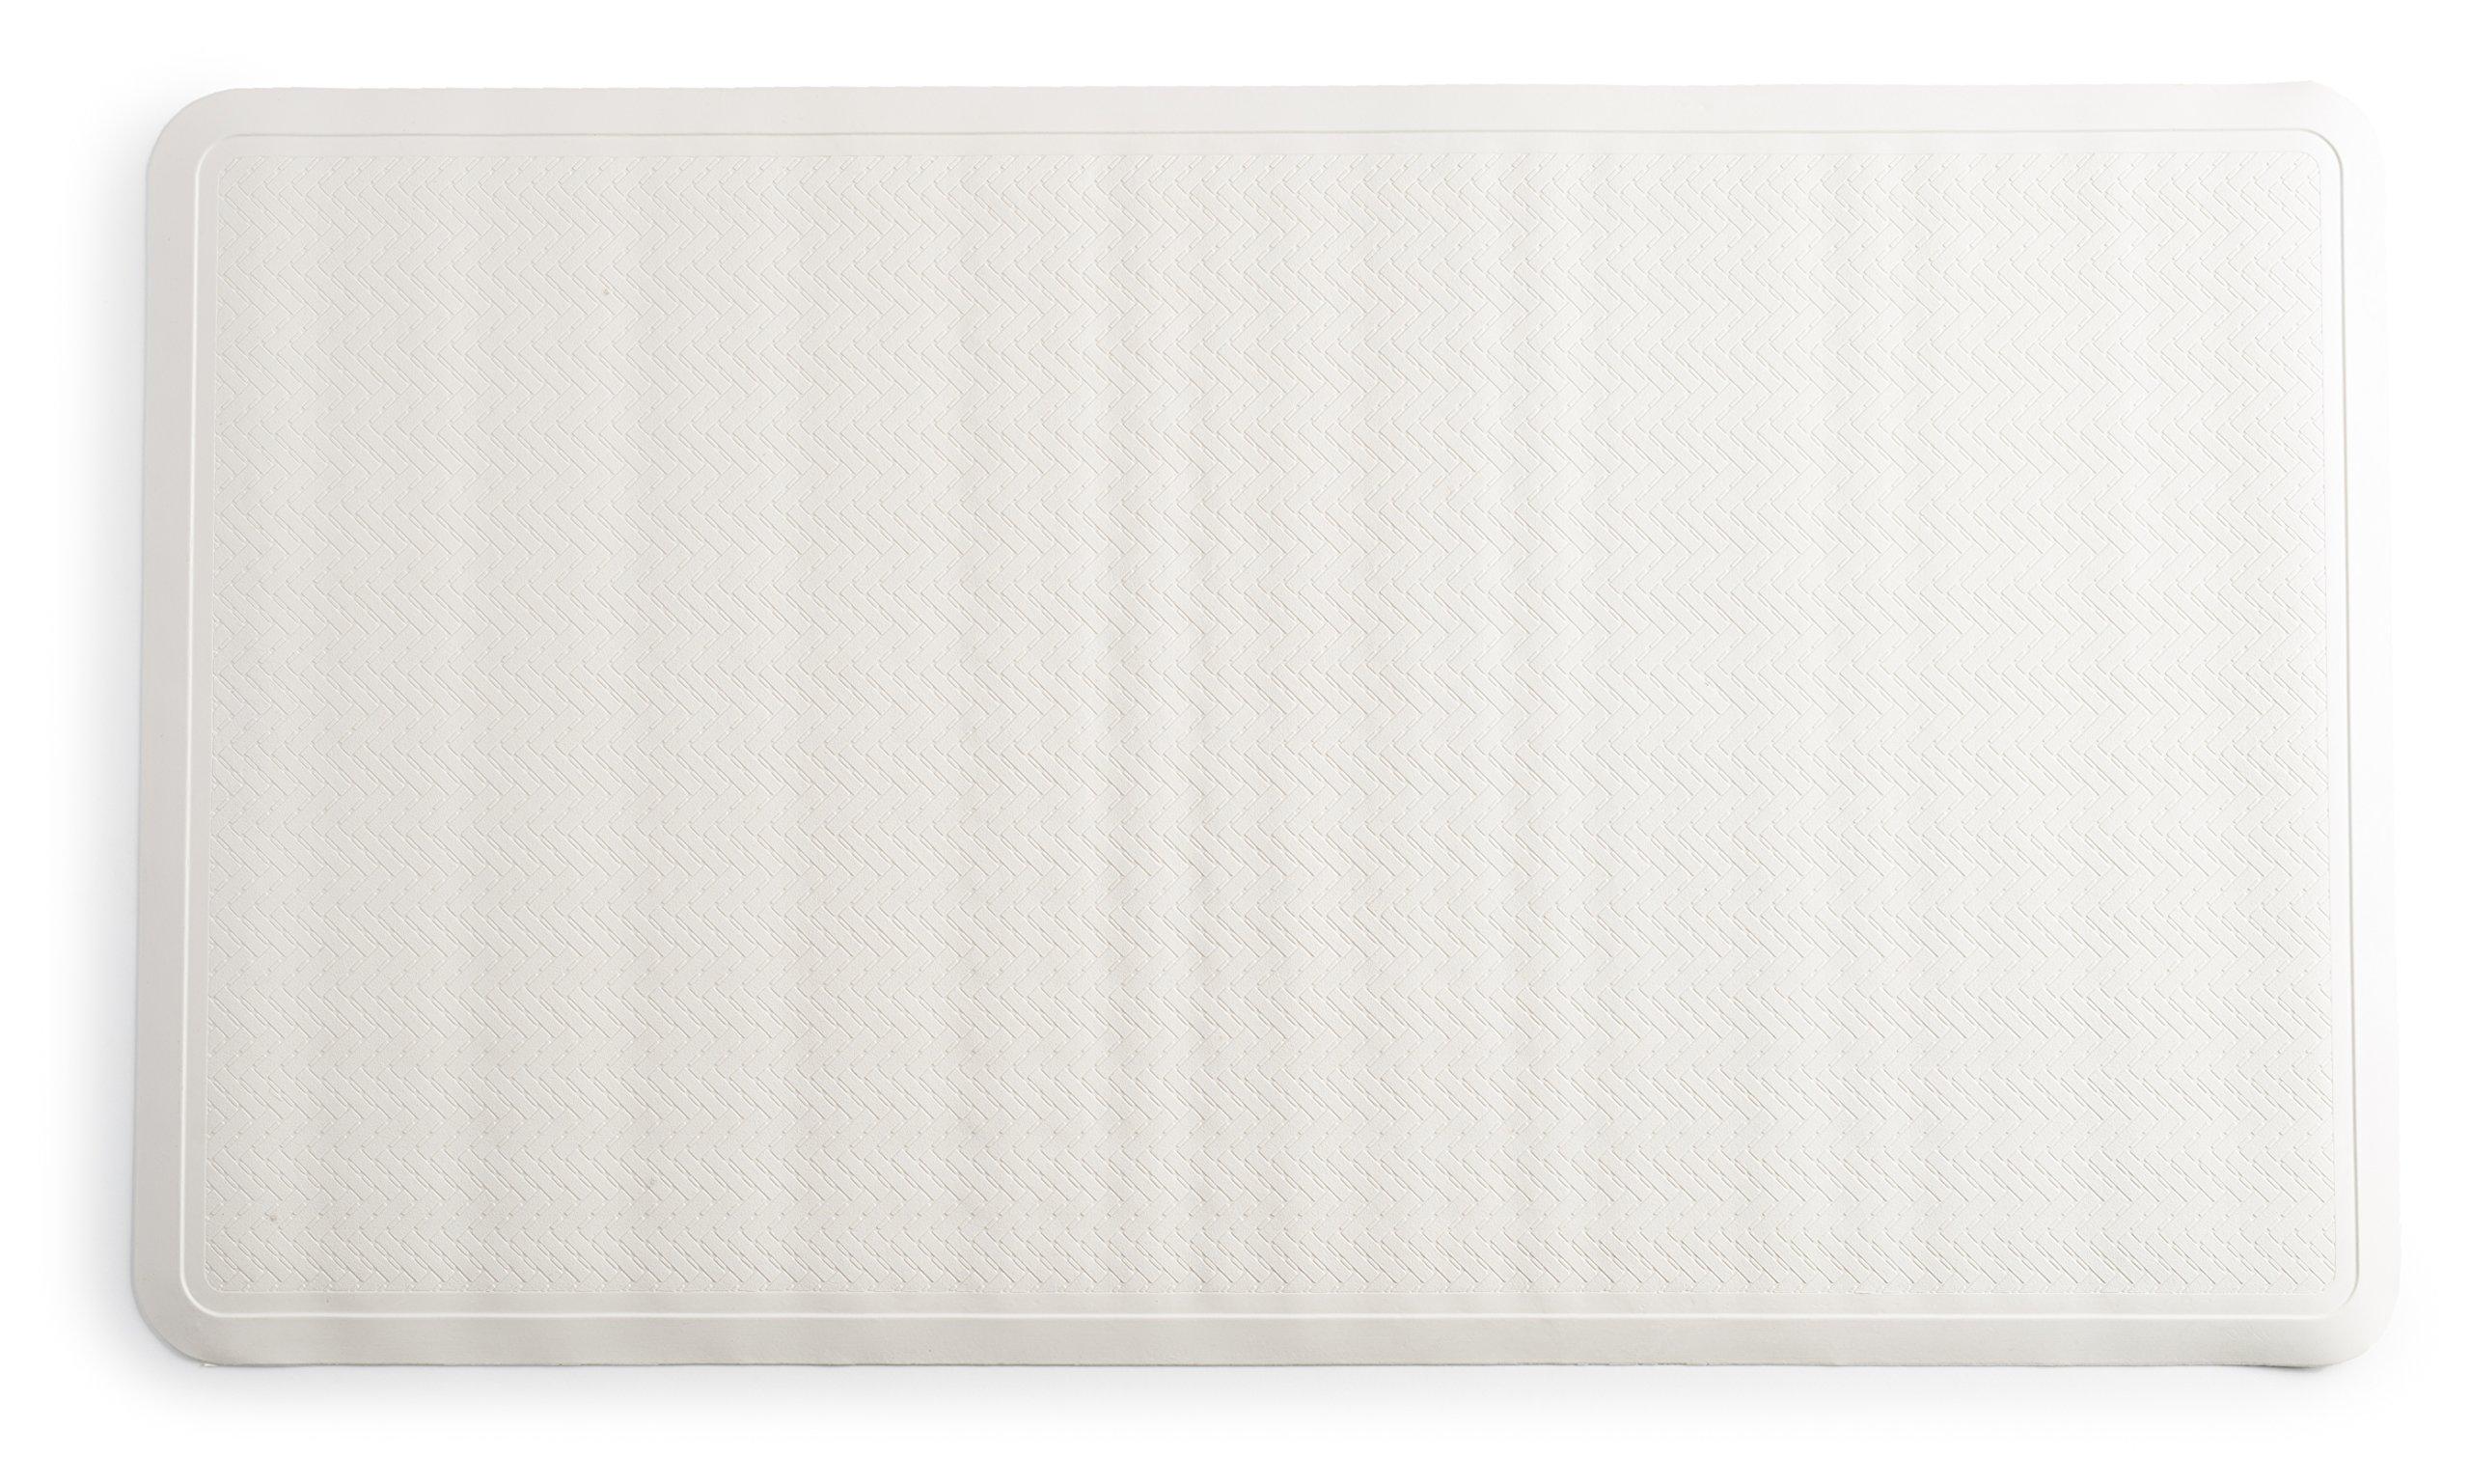 Epica Anti Slip Machine Washable Anti Bacterial Bath Mat